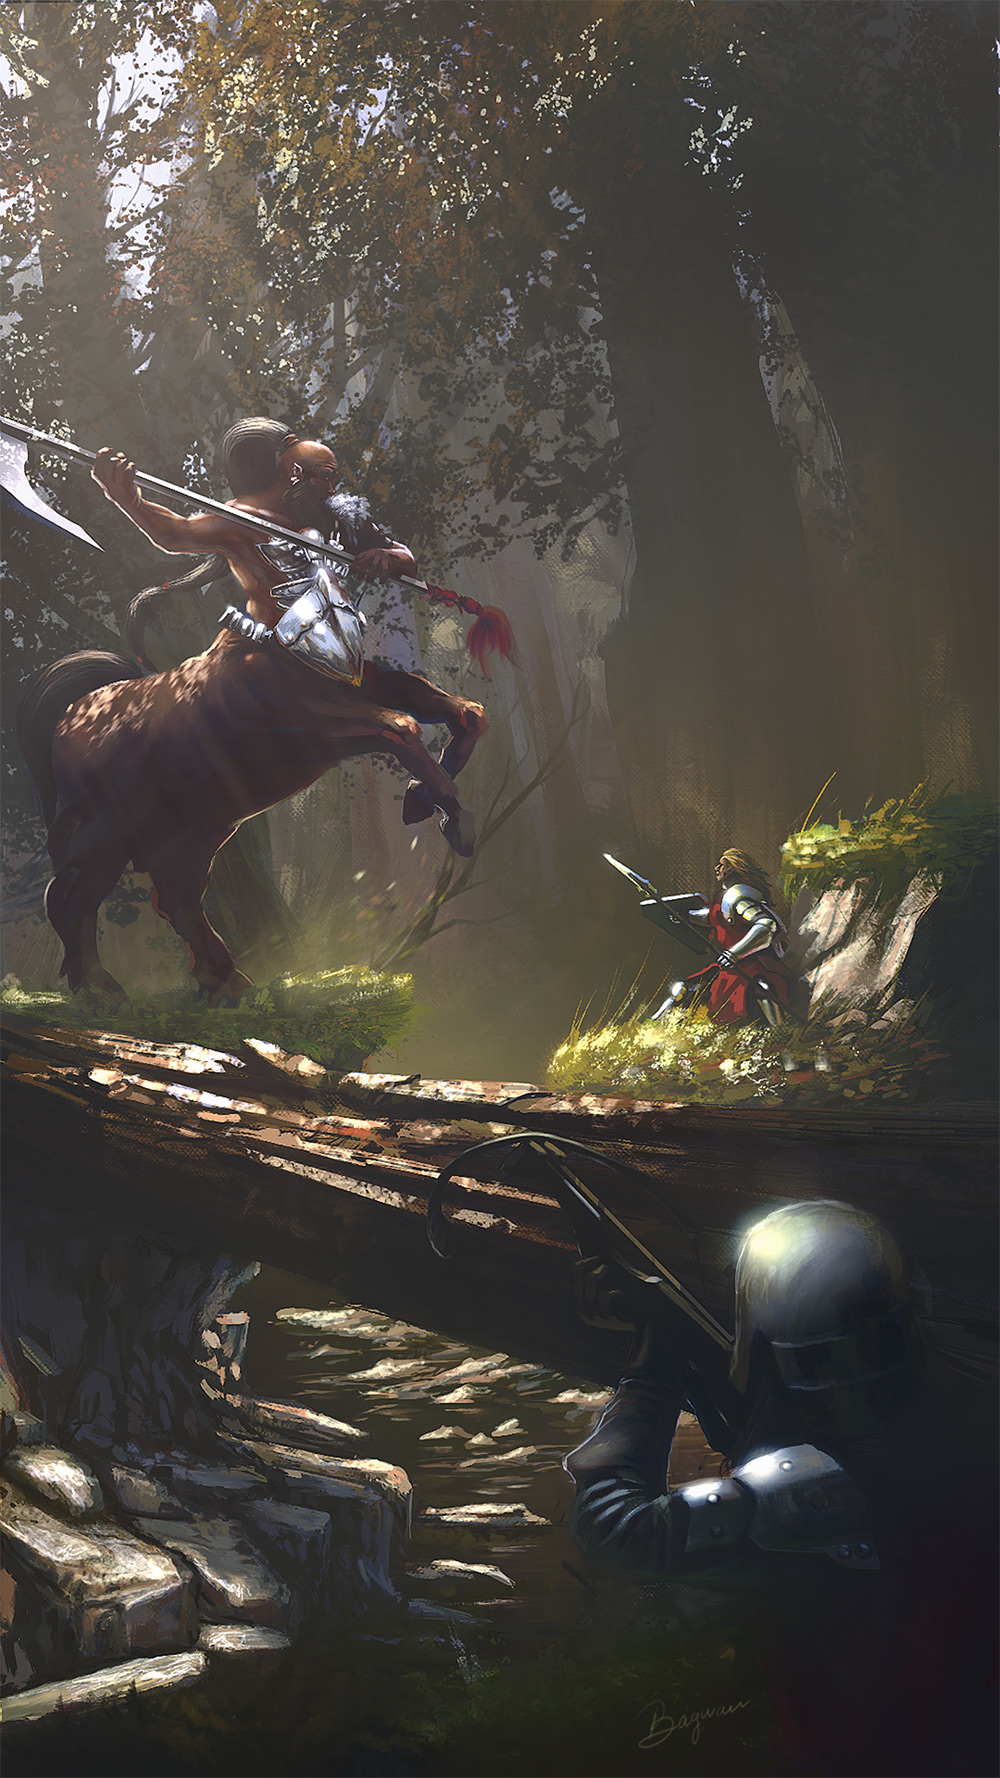 centaur-hunting-oic